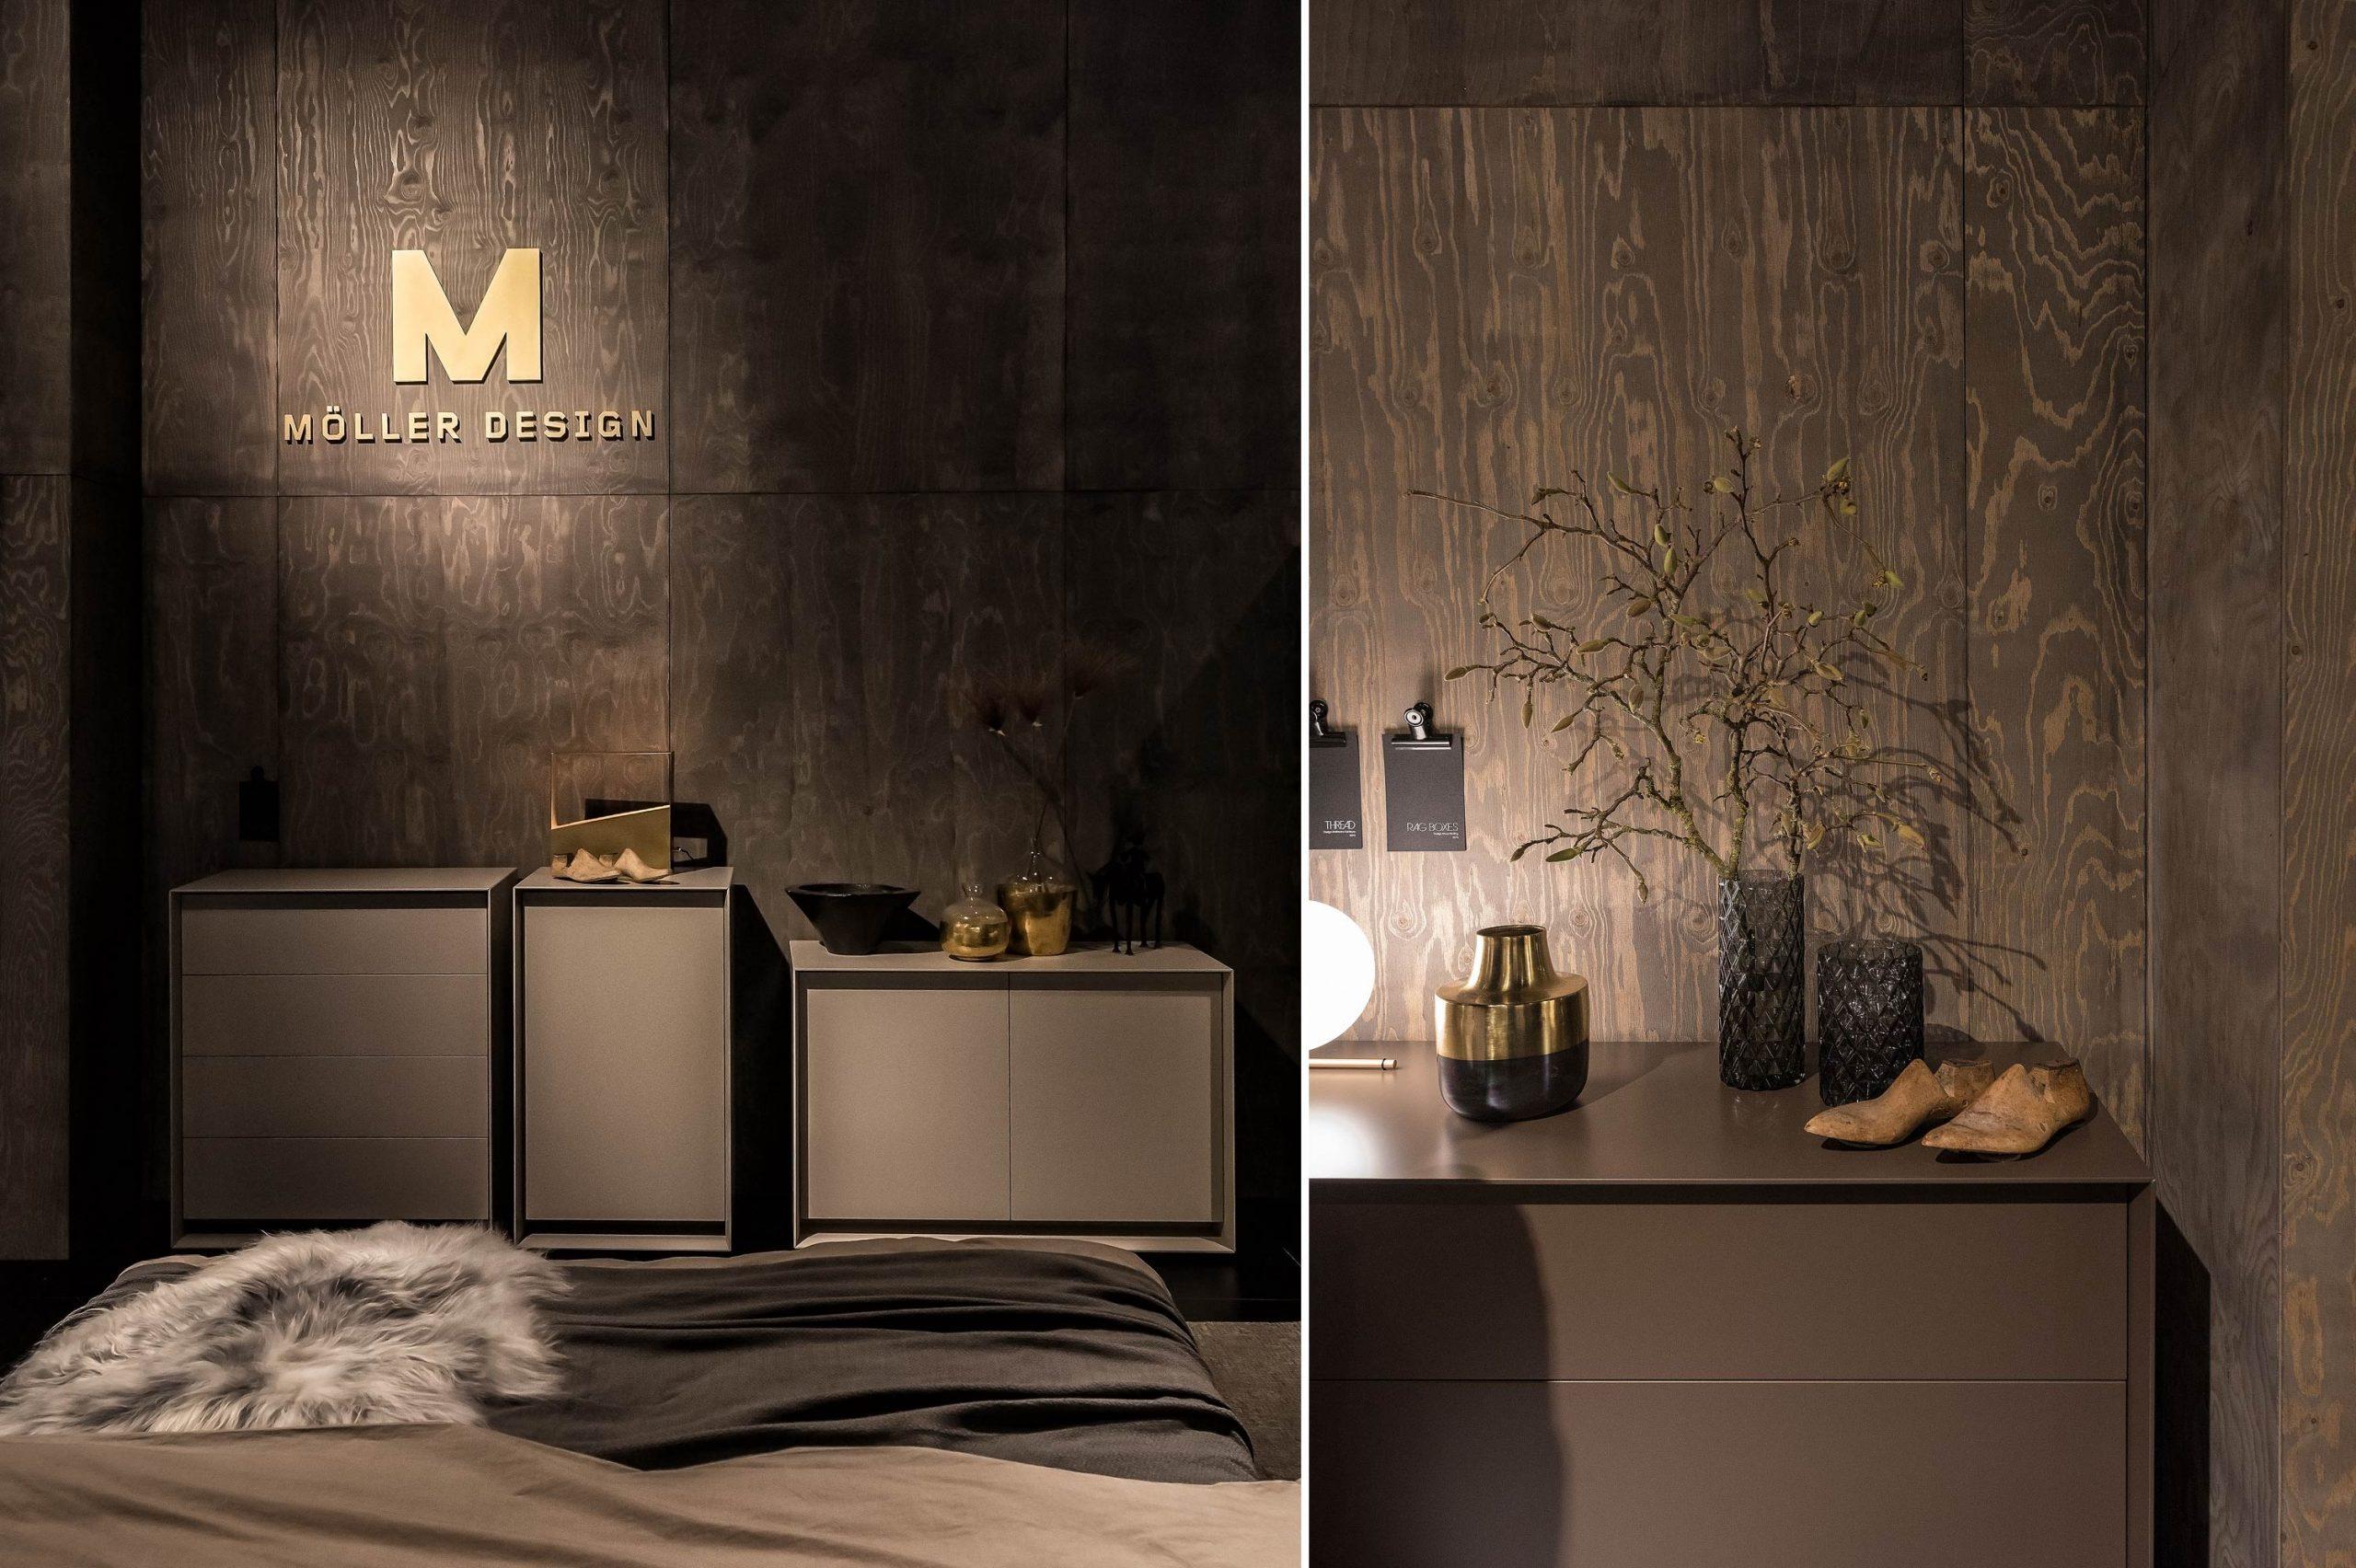 IMM Cologne beurs - Keulen, Duitsland - Interieurfotograaf Chiel de Nooyer